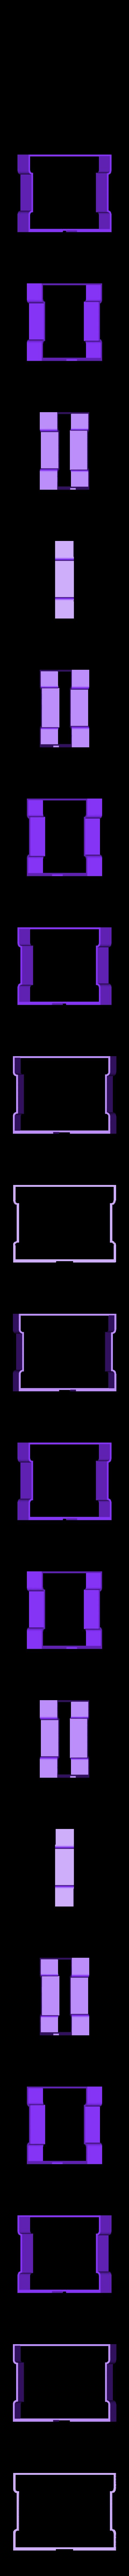 Ribbon 2.stl Download free STL file Simple Secret Box V:  Gift Box Edition • Model to 3D print, gzumwalt